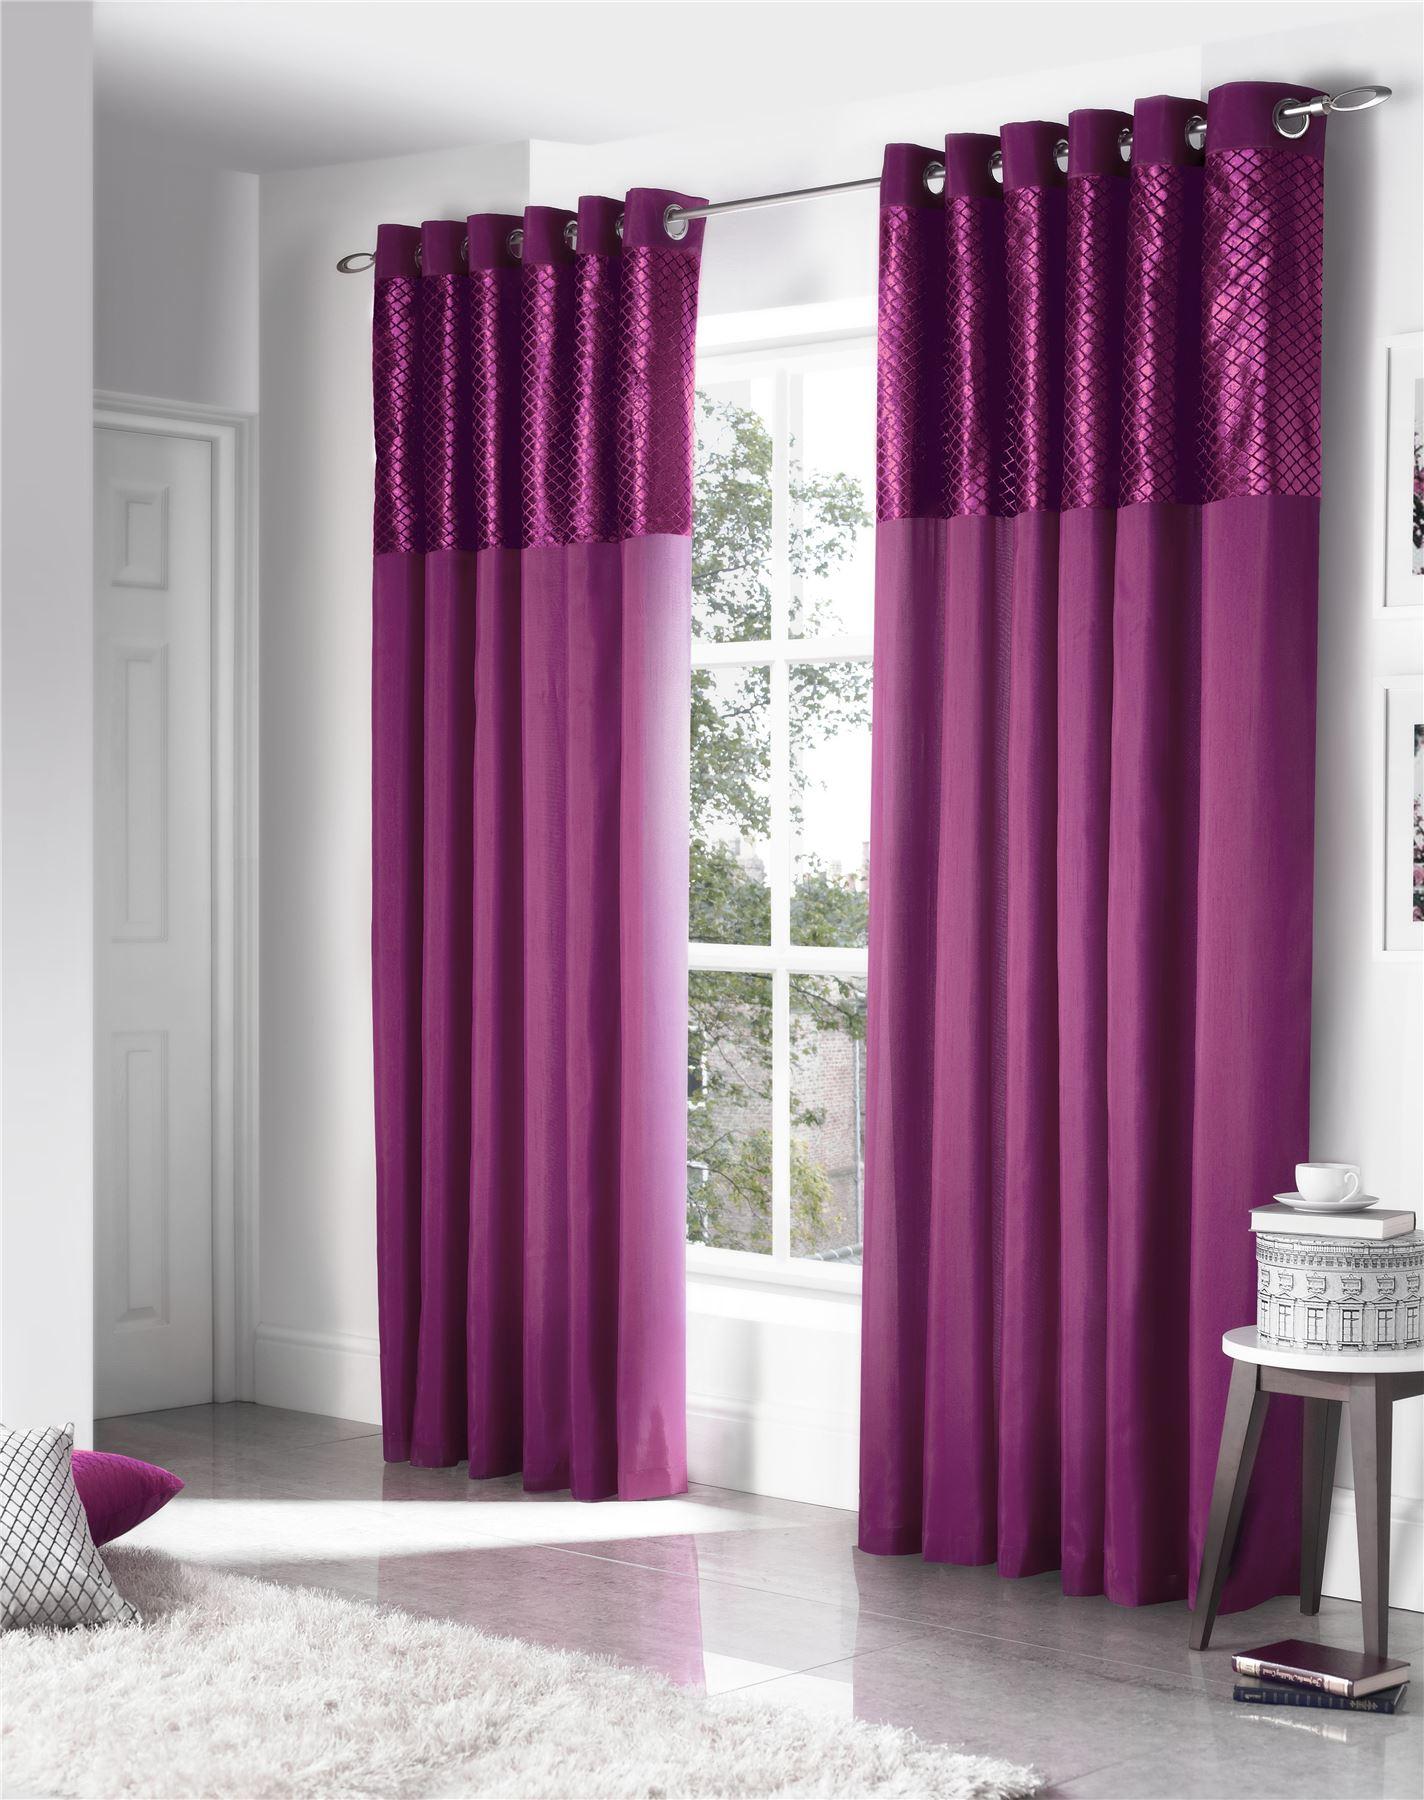 Faux silk cut velvet purple lined ring top curtains drapes 5 sizes